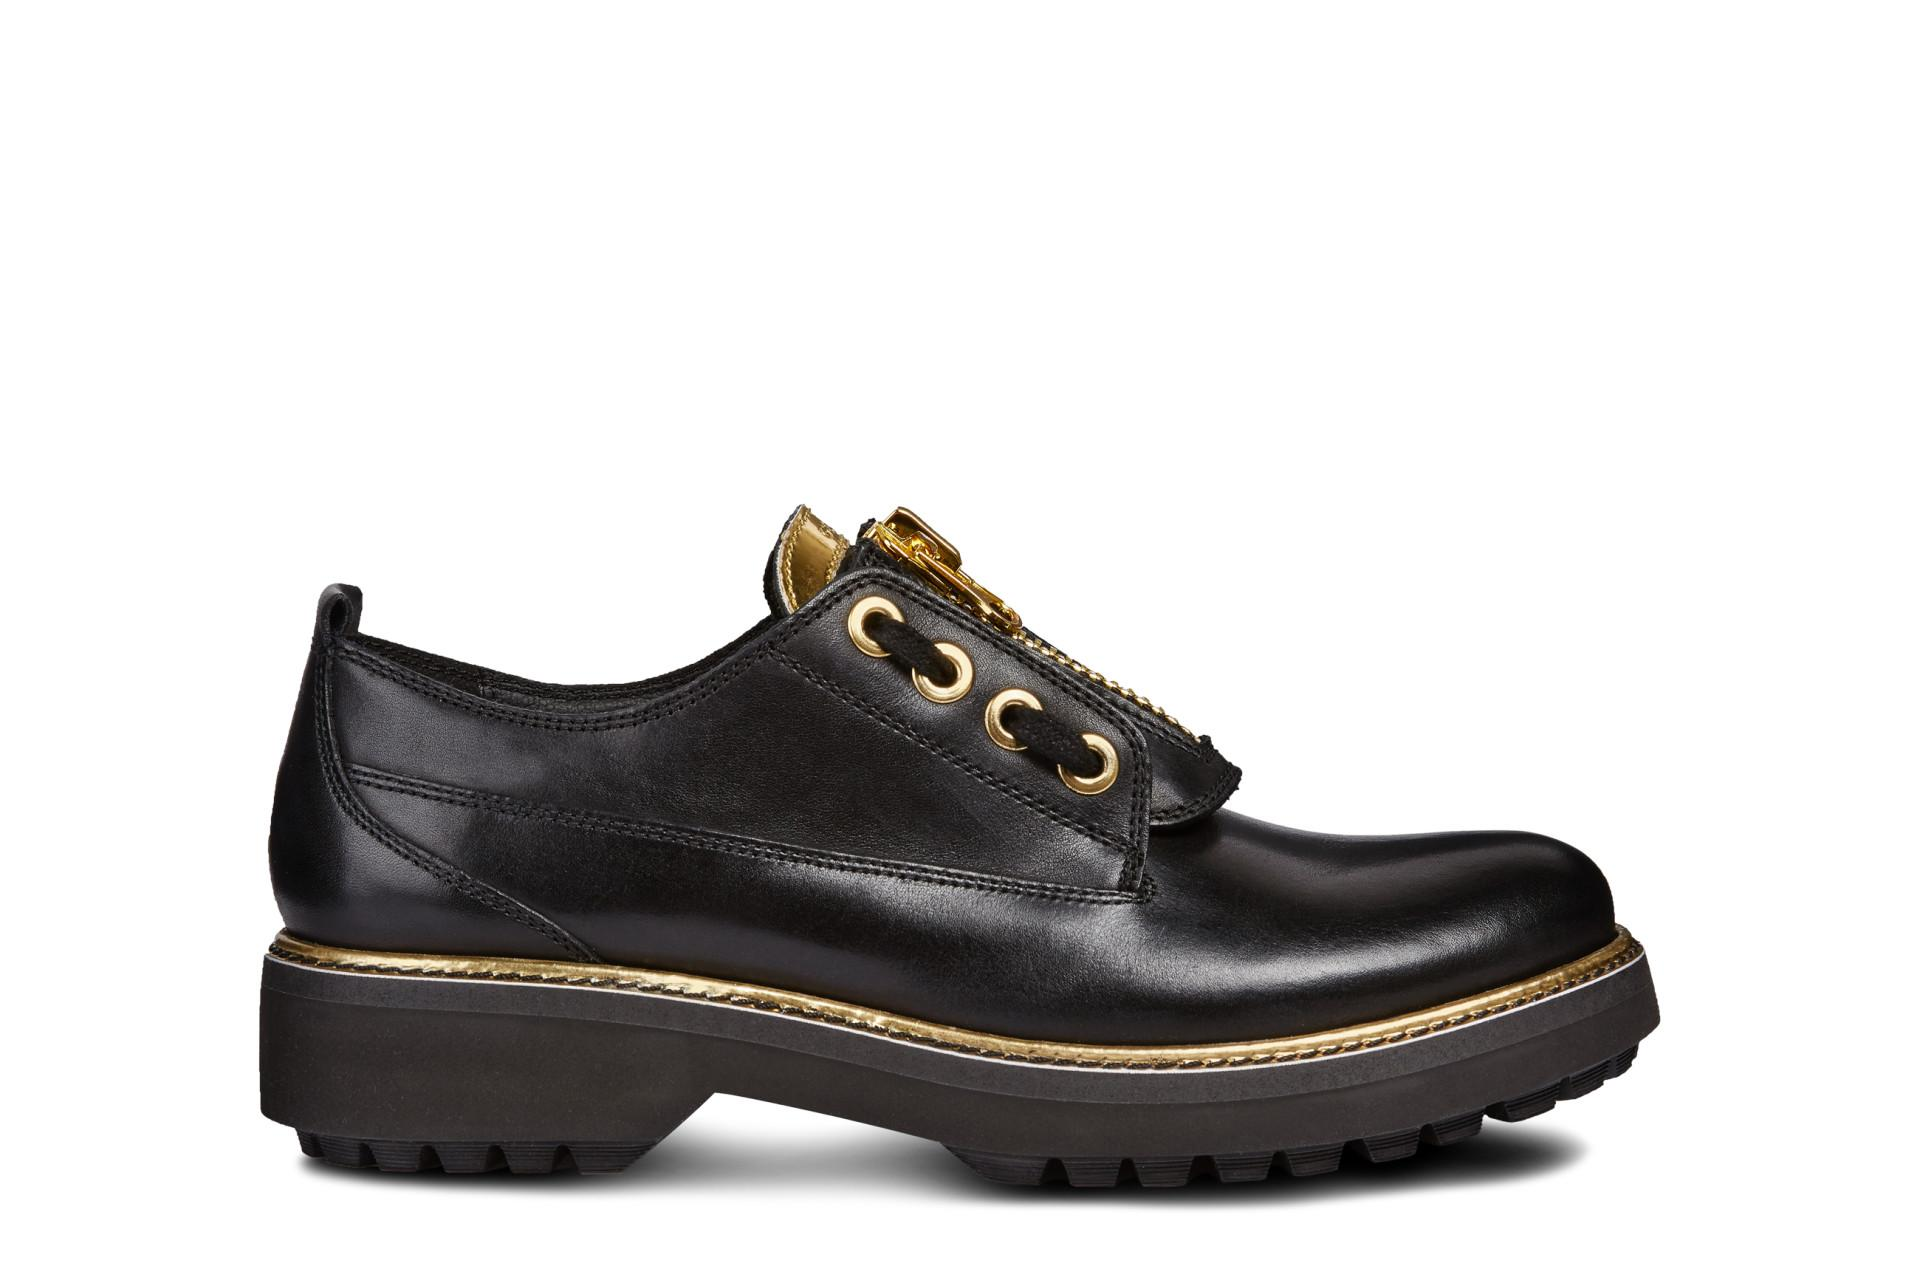 1a076d84479 Buy Geox Heeled Sandals   Women Fashion   Lazada.sg